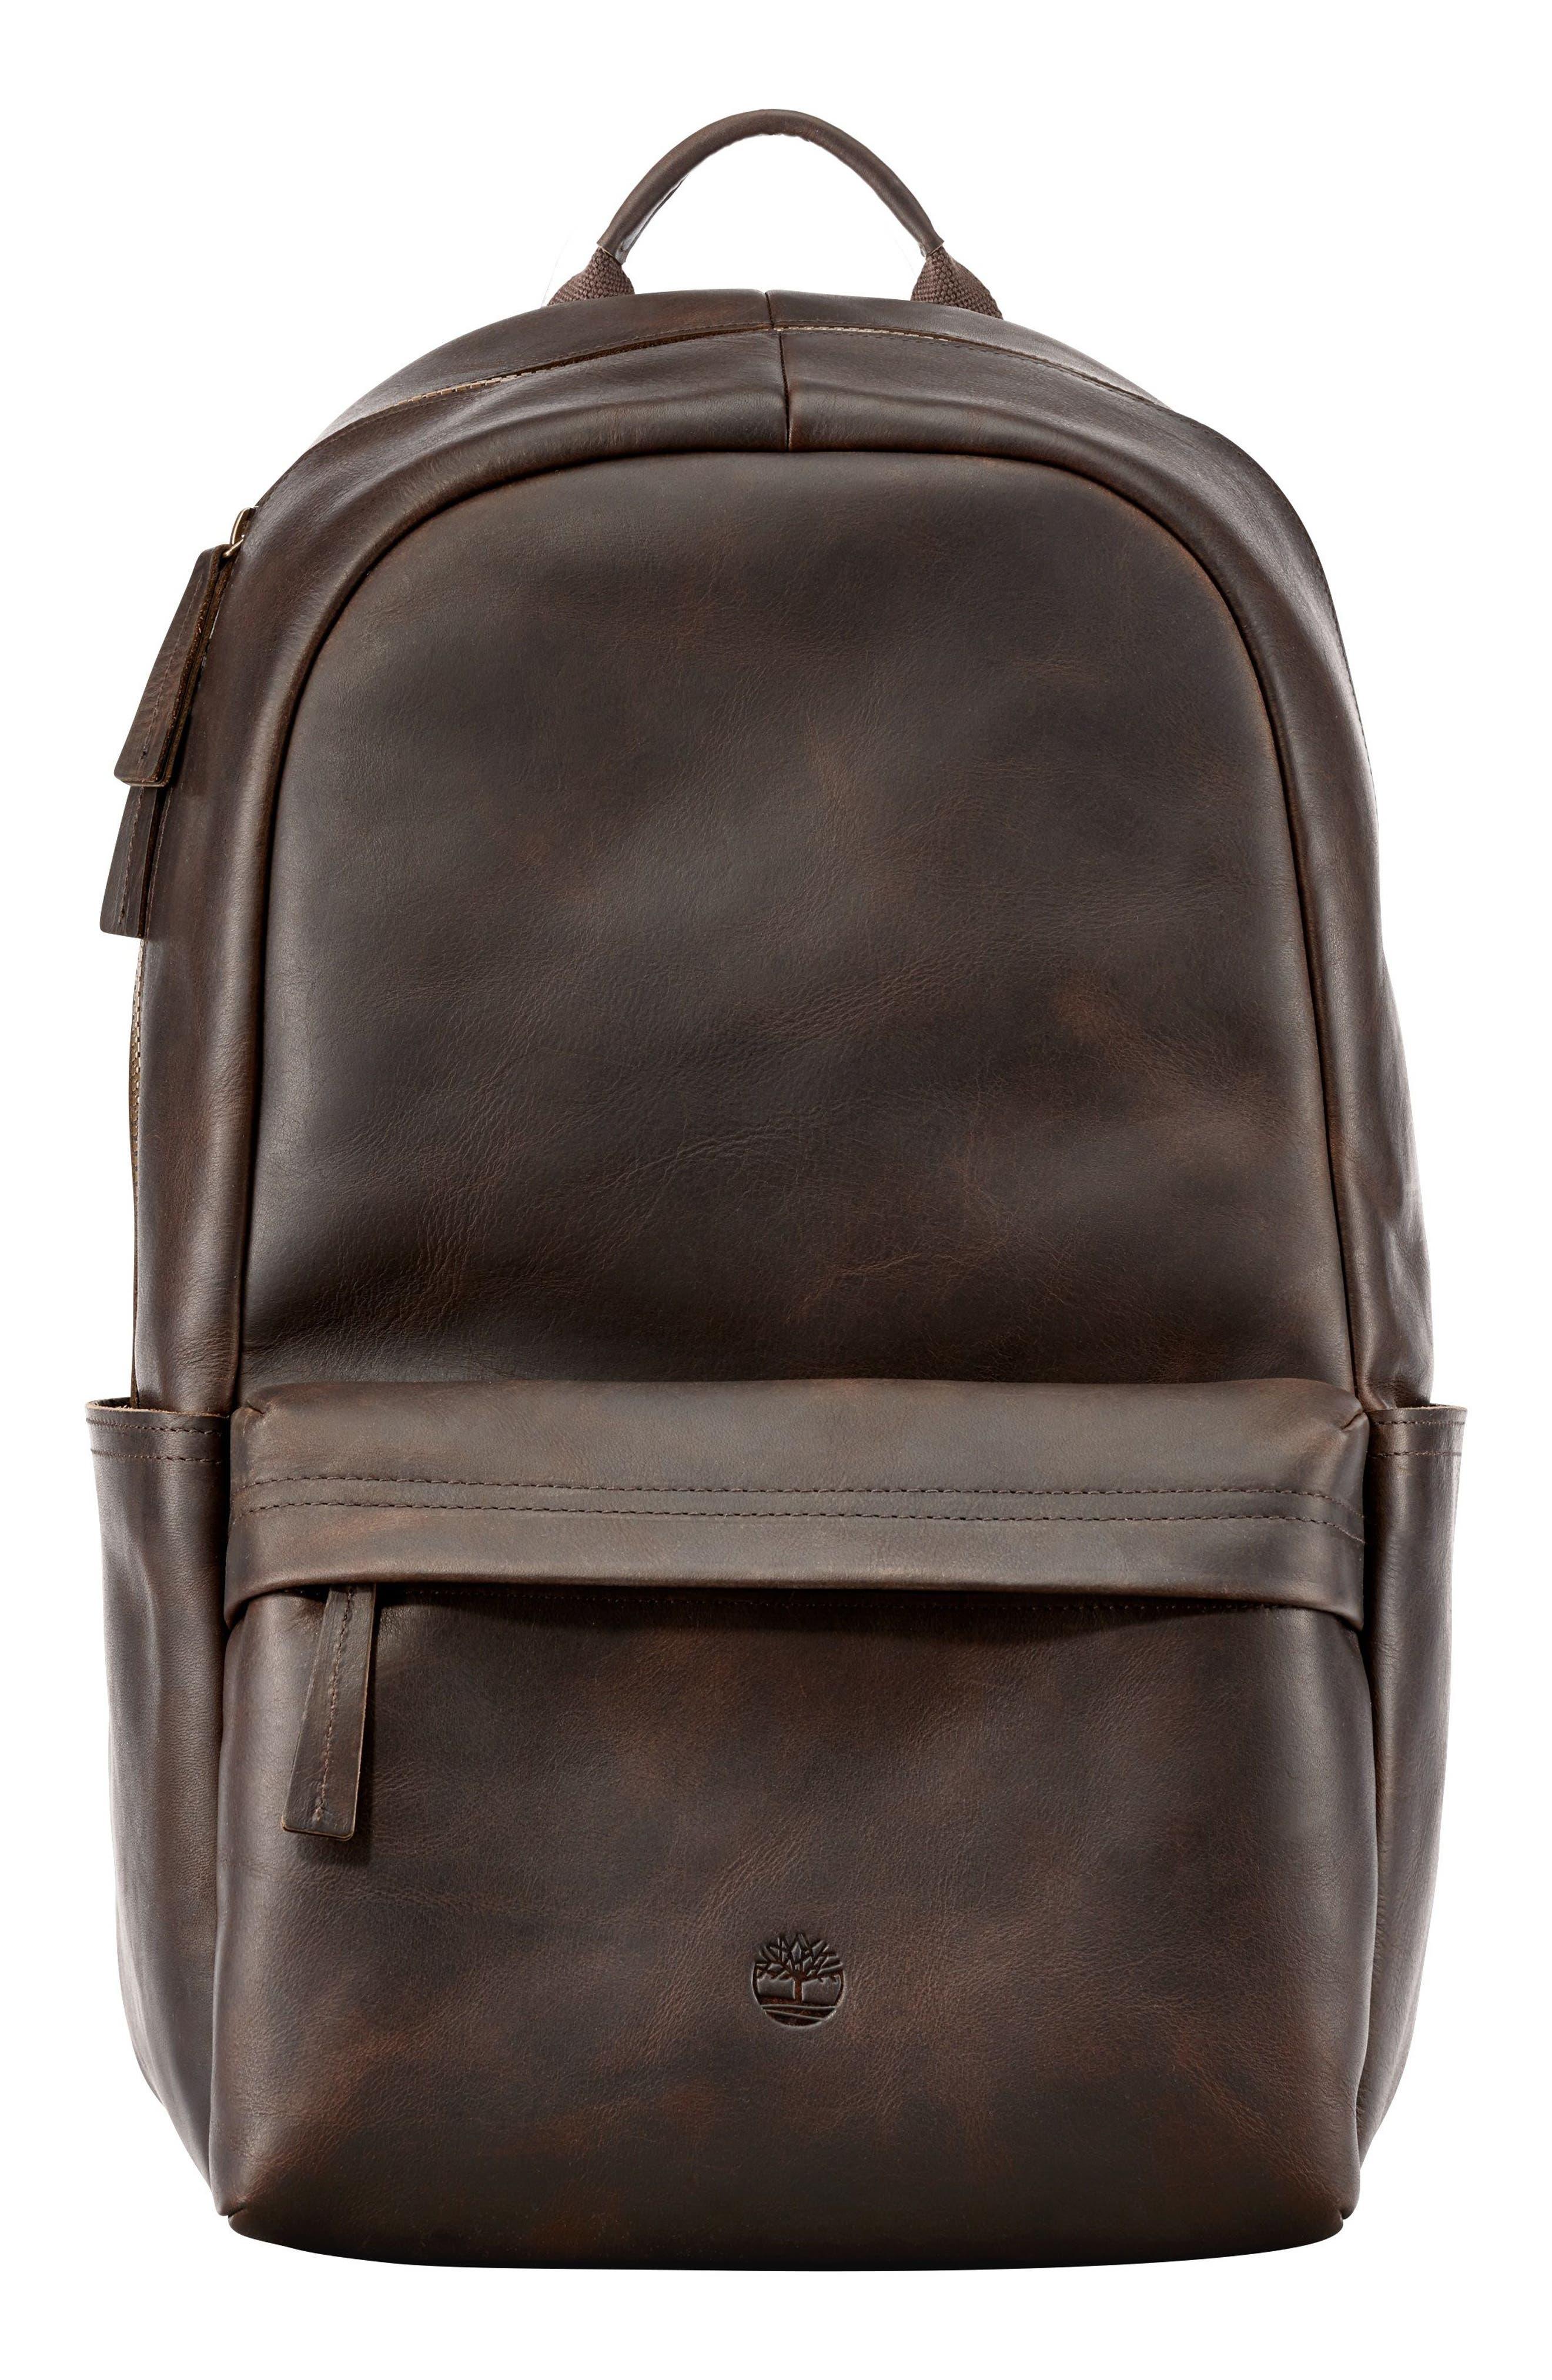 TIMBERLAND, Tuckerman Leather Backpack, Main thumbnail 1, color, 200